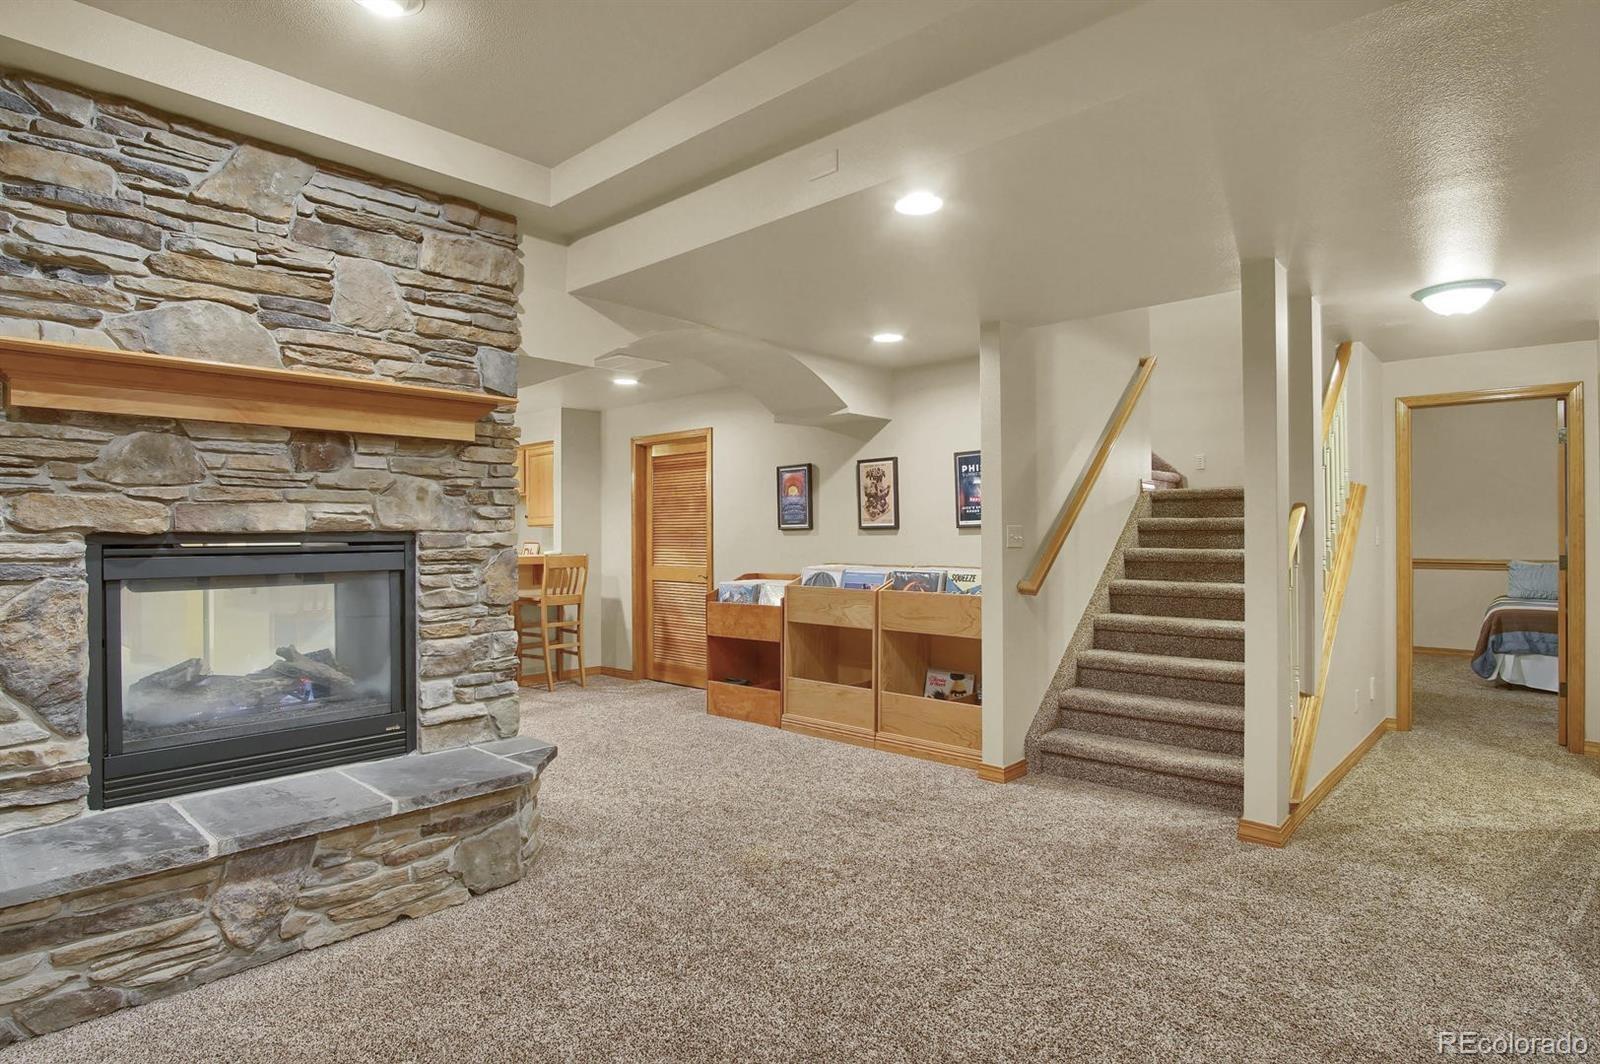 MLS# 5244810 - 1 - 4470  Wavy Oak Drive, Colorado Springs, CO 80908